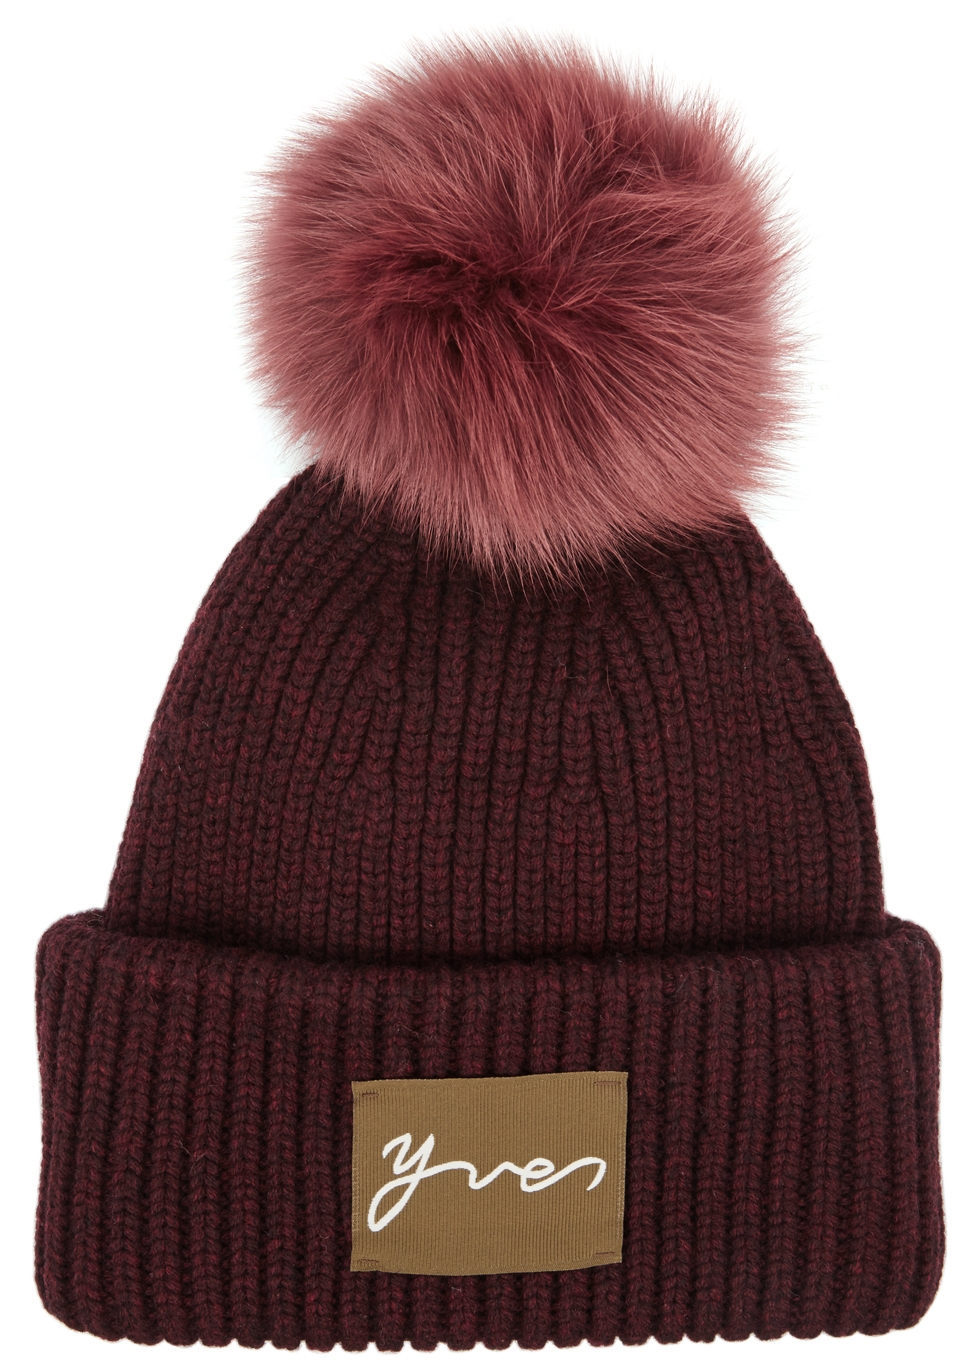 5c79e86e2cb Designer Beanies - Women s Luxury Hats - Harvey Nichols